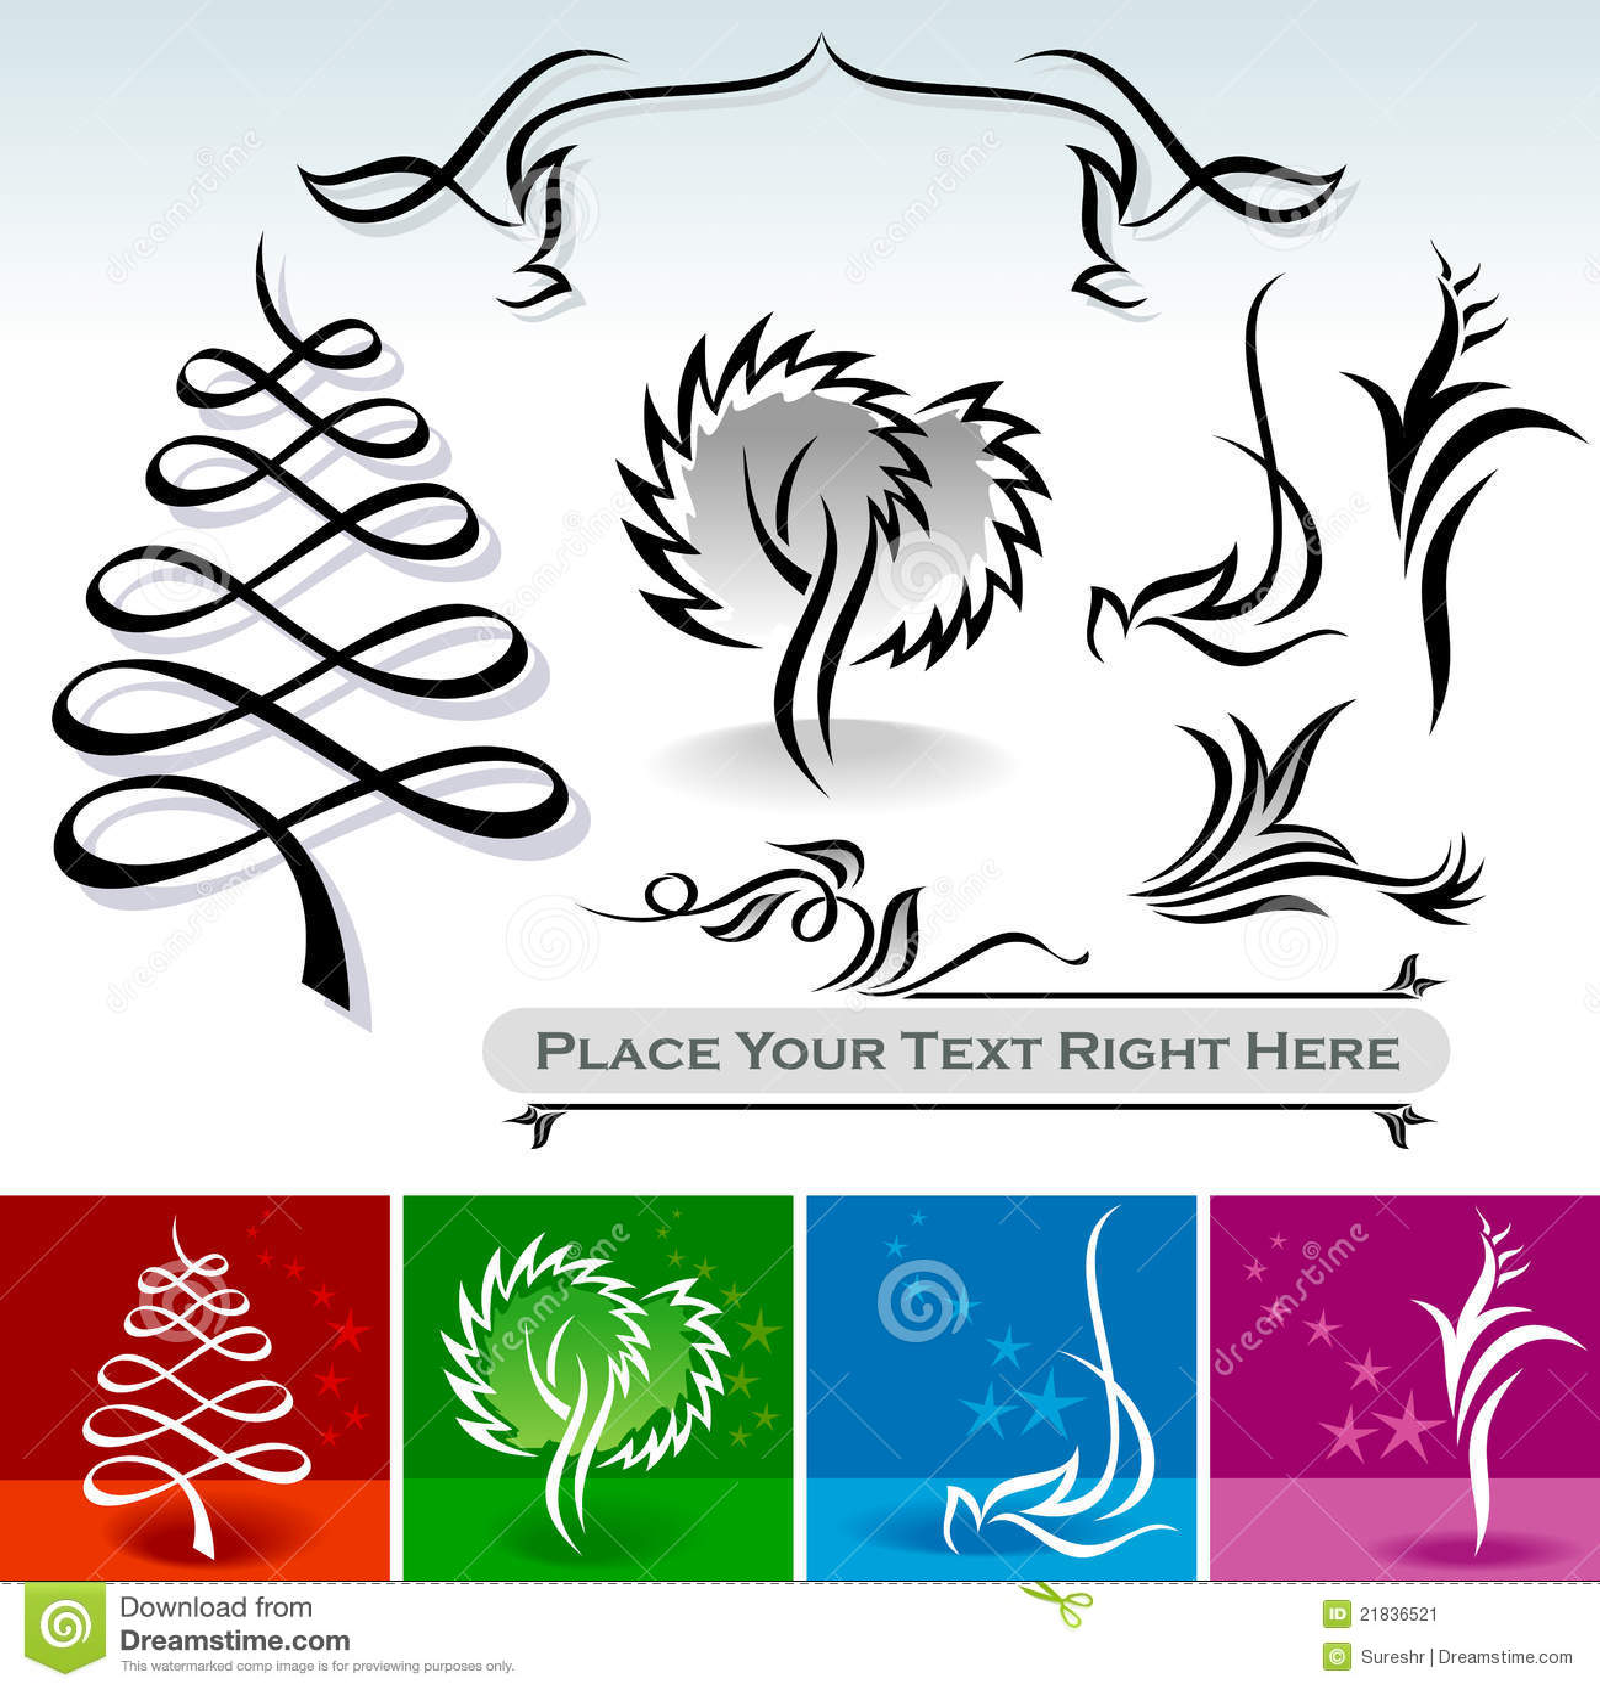 Natural Calligraphic Designs And Decoration